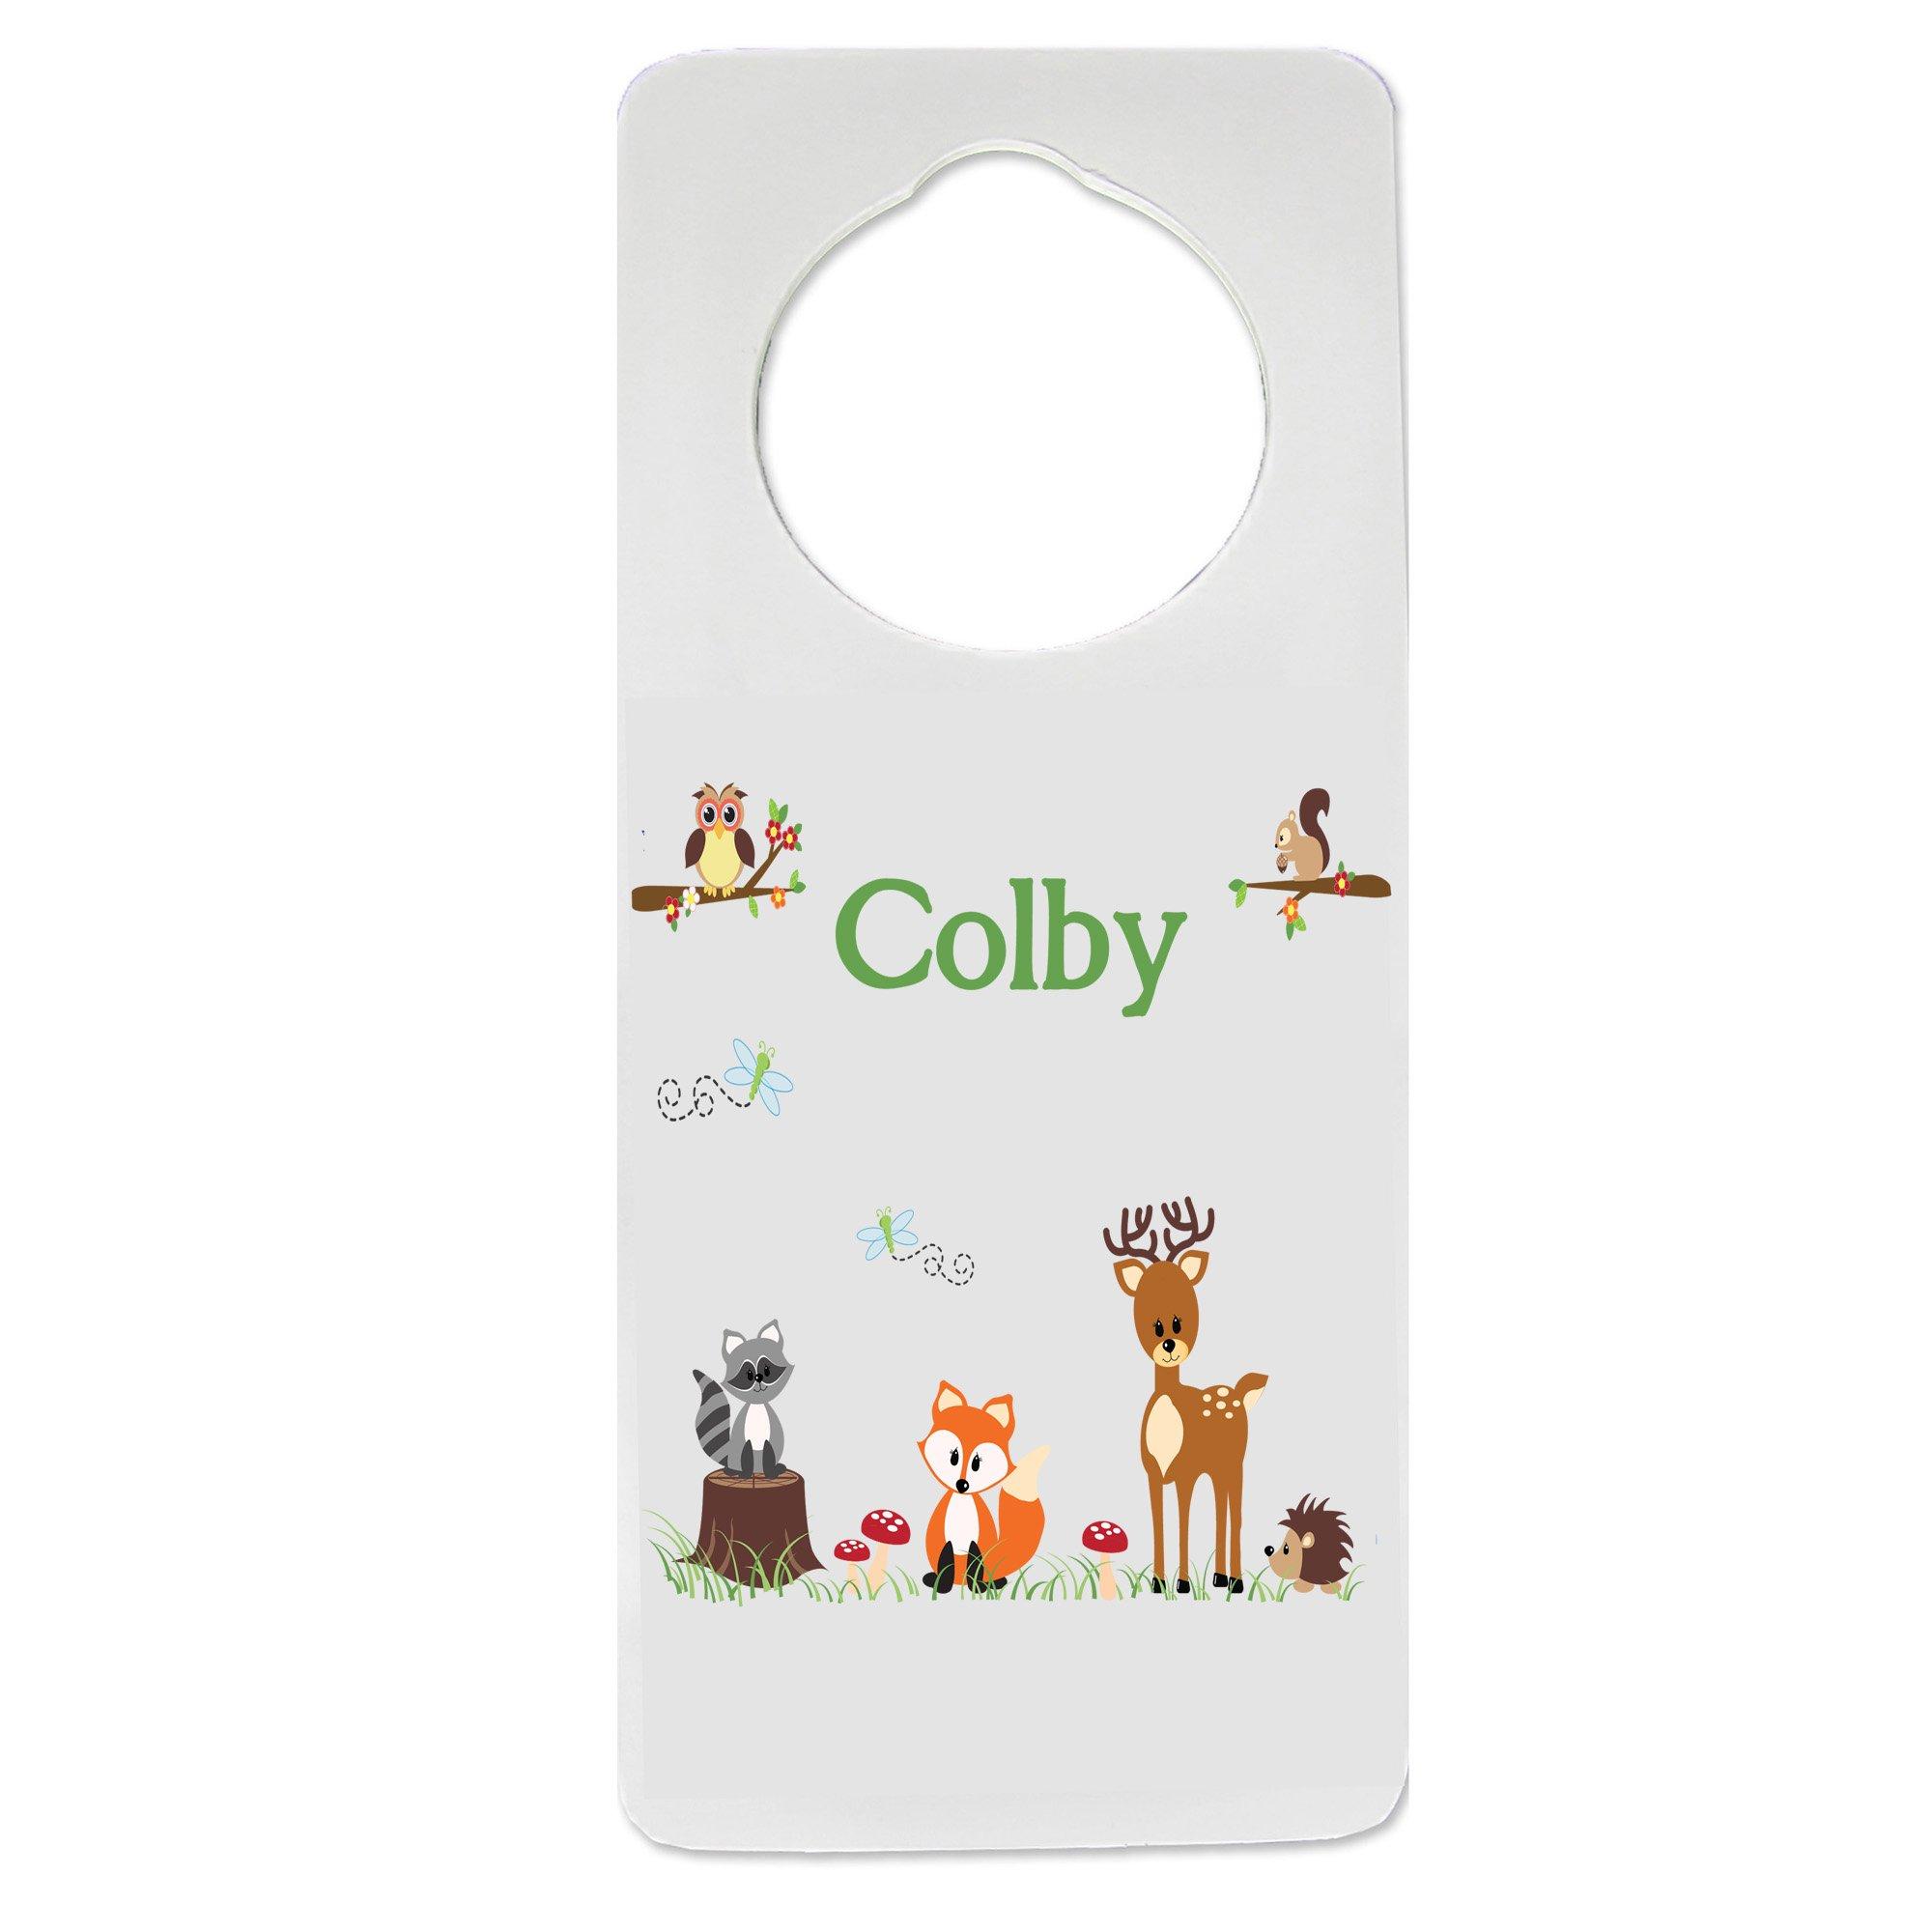 Personalized Nursery Door Hanger with Green Forest Animal design